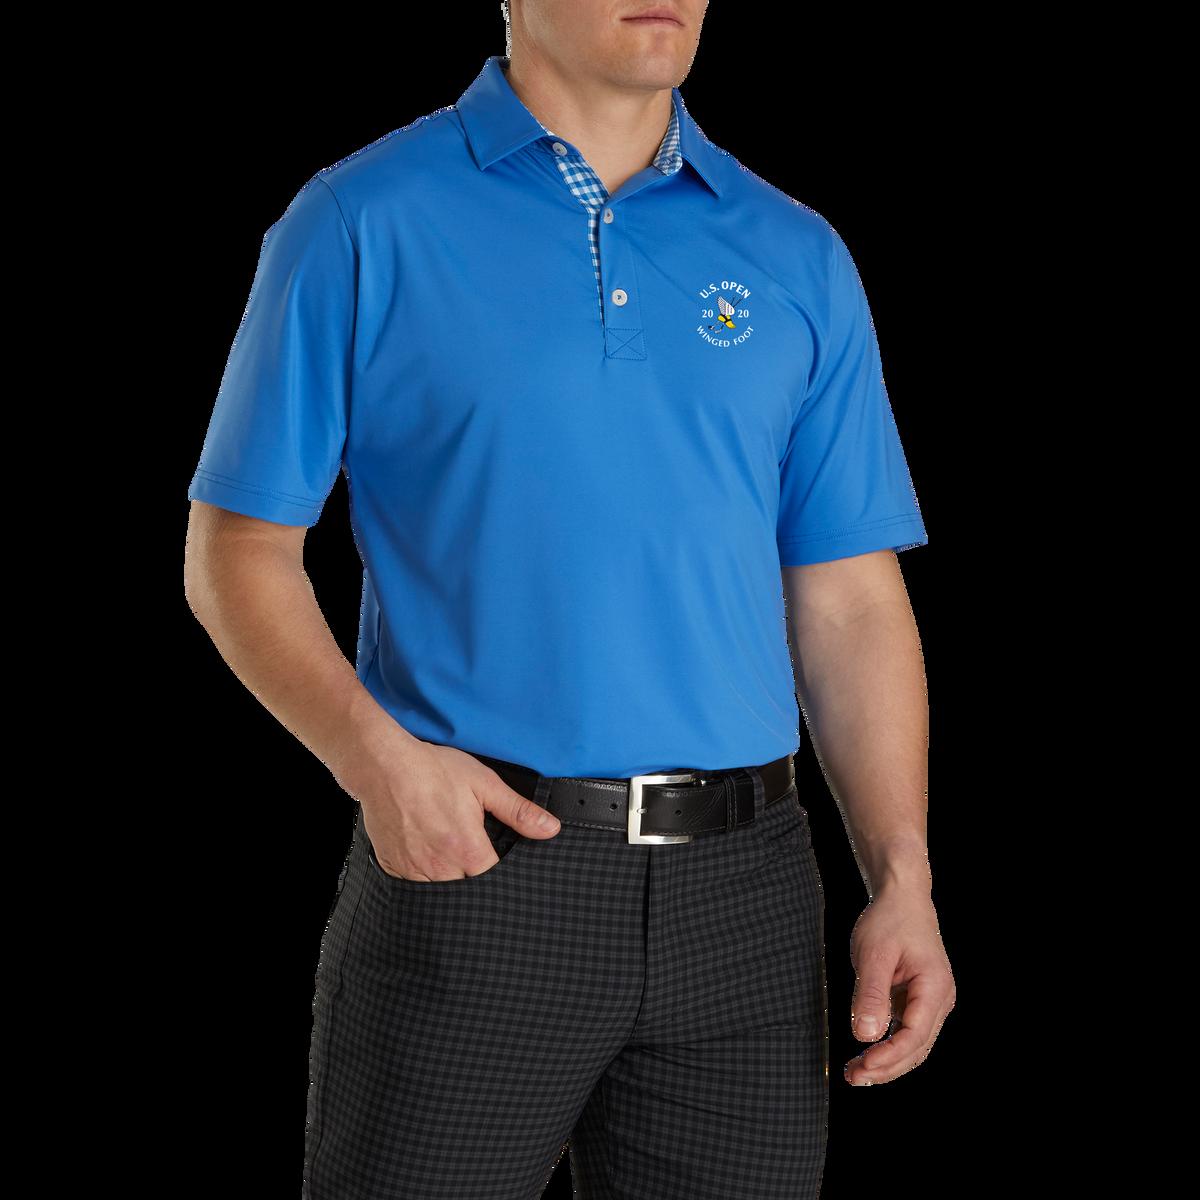 2020 U.S. Open Athletic Fit Lisle Solid Gingham Trim Self Collar